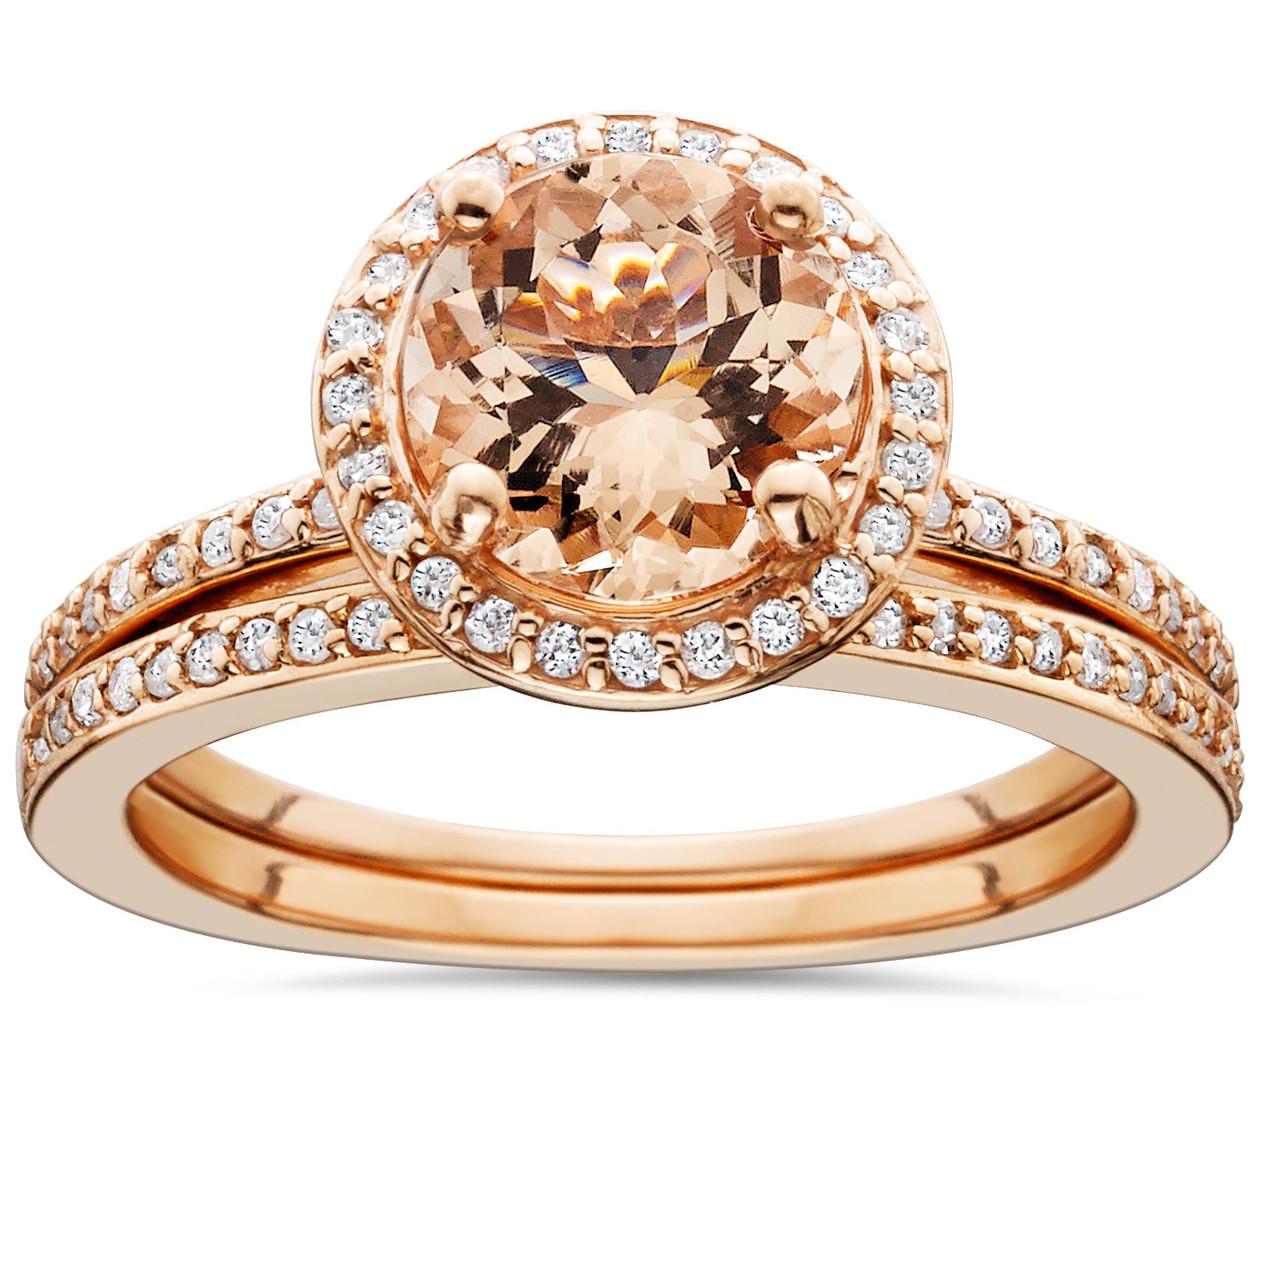 eea795f79a64d 1 3 4 Carat Morganite   Diamond Halo Engagement Wedding Ring Set 14K ...